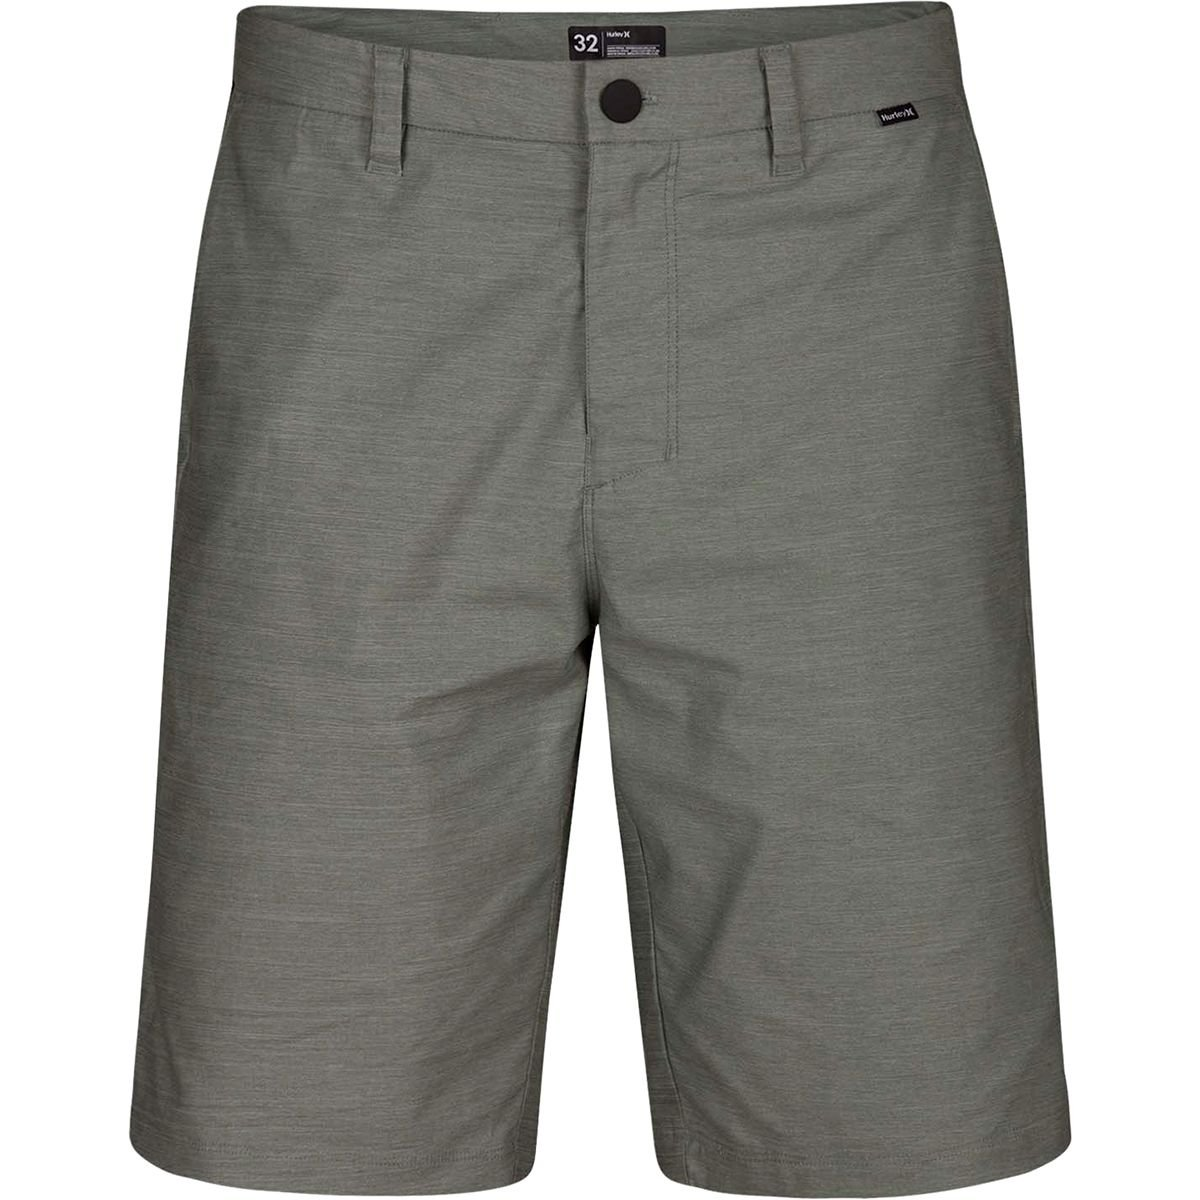 Hurley 922660 Men's Dri-Fit Breathe Shorts